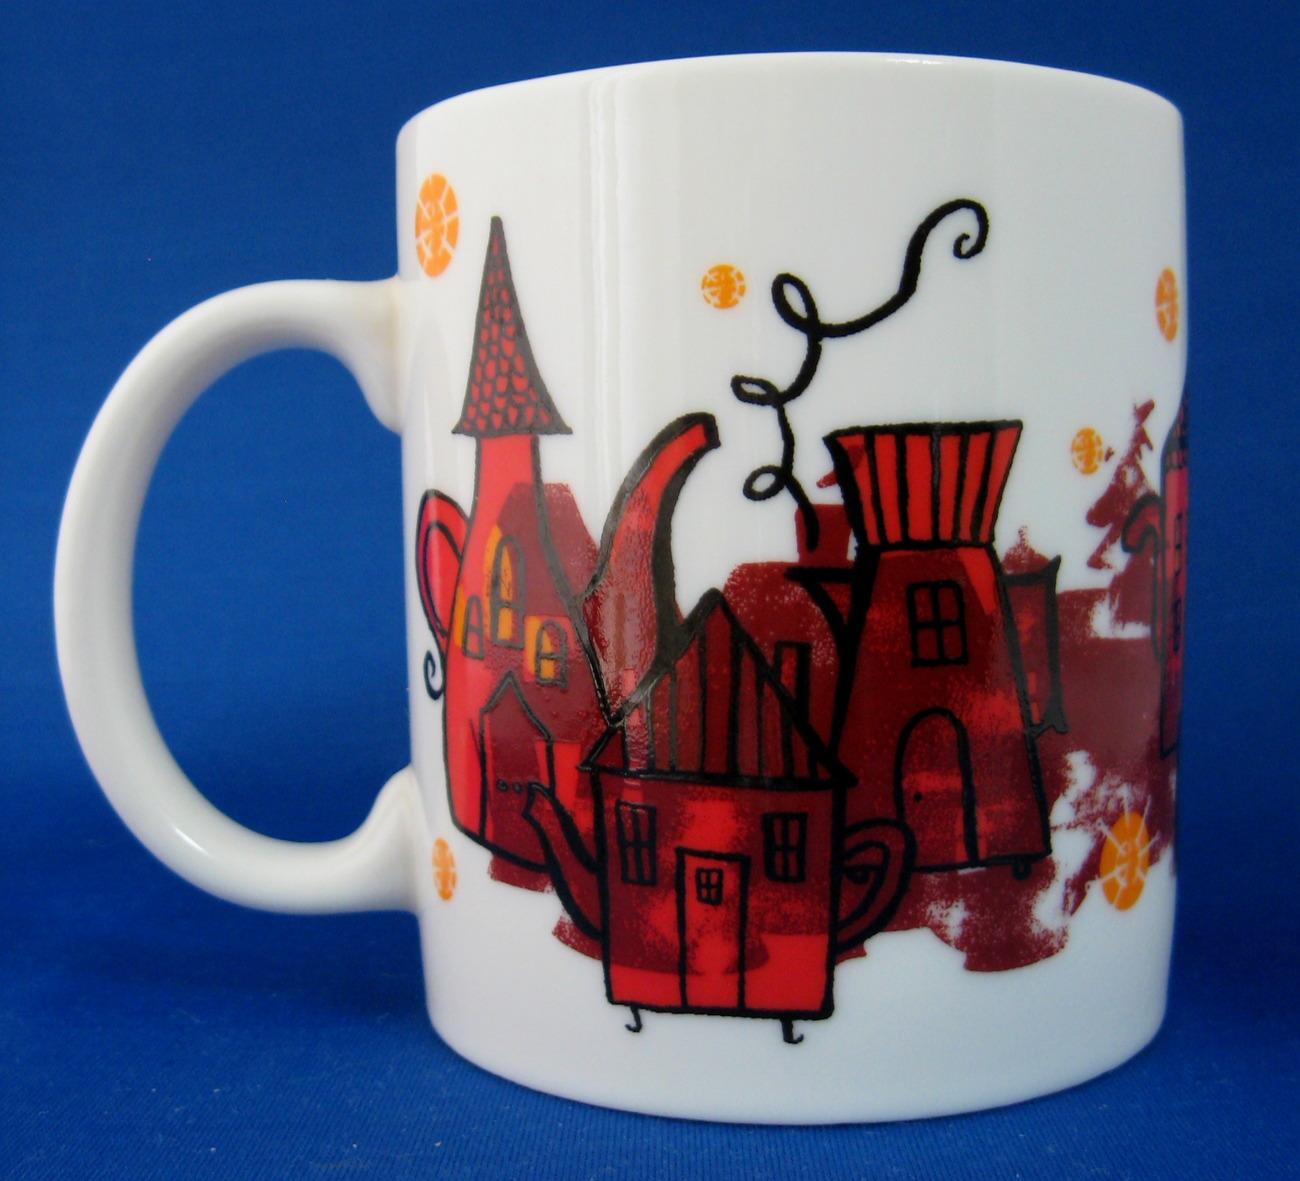 Mug Starbucks Red And Black Teapot Coffeepot Houses Coffee 2000